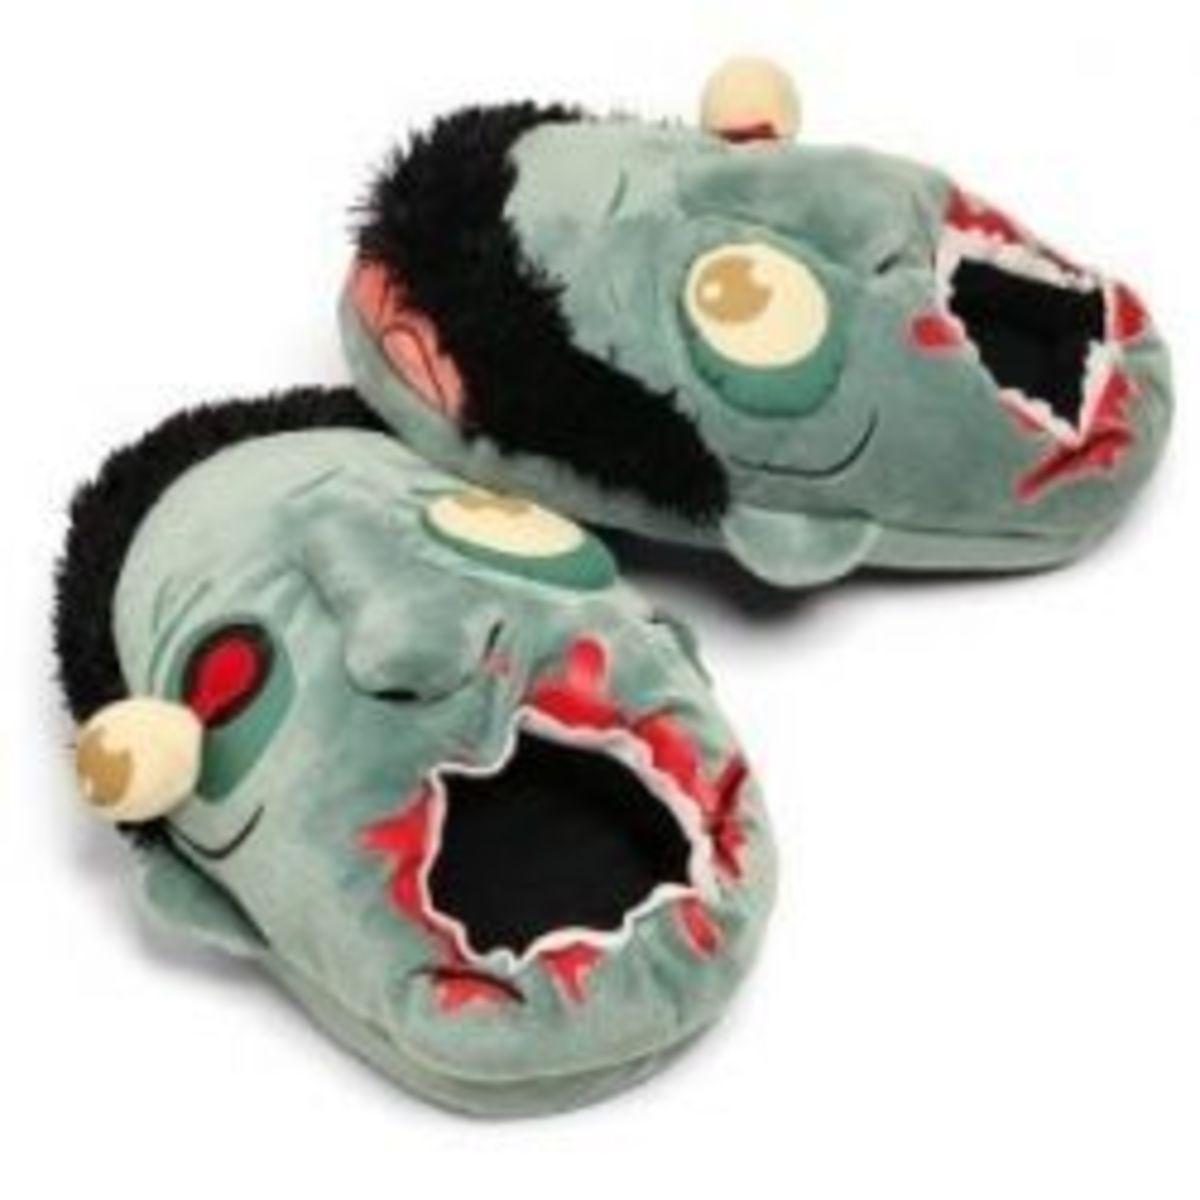 Zombie Plush Slippers